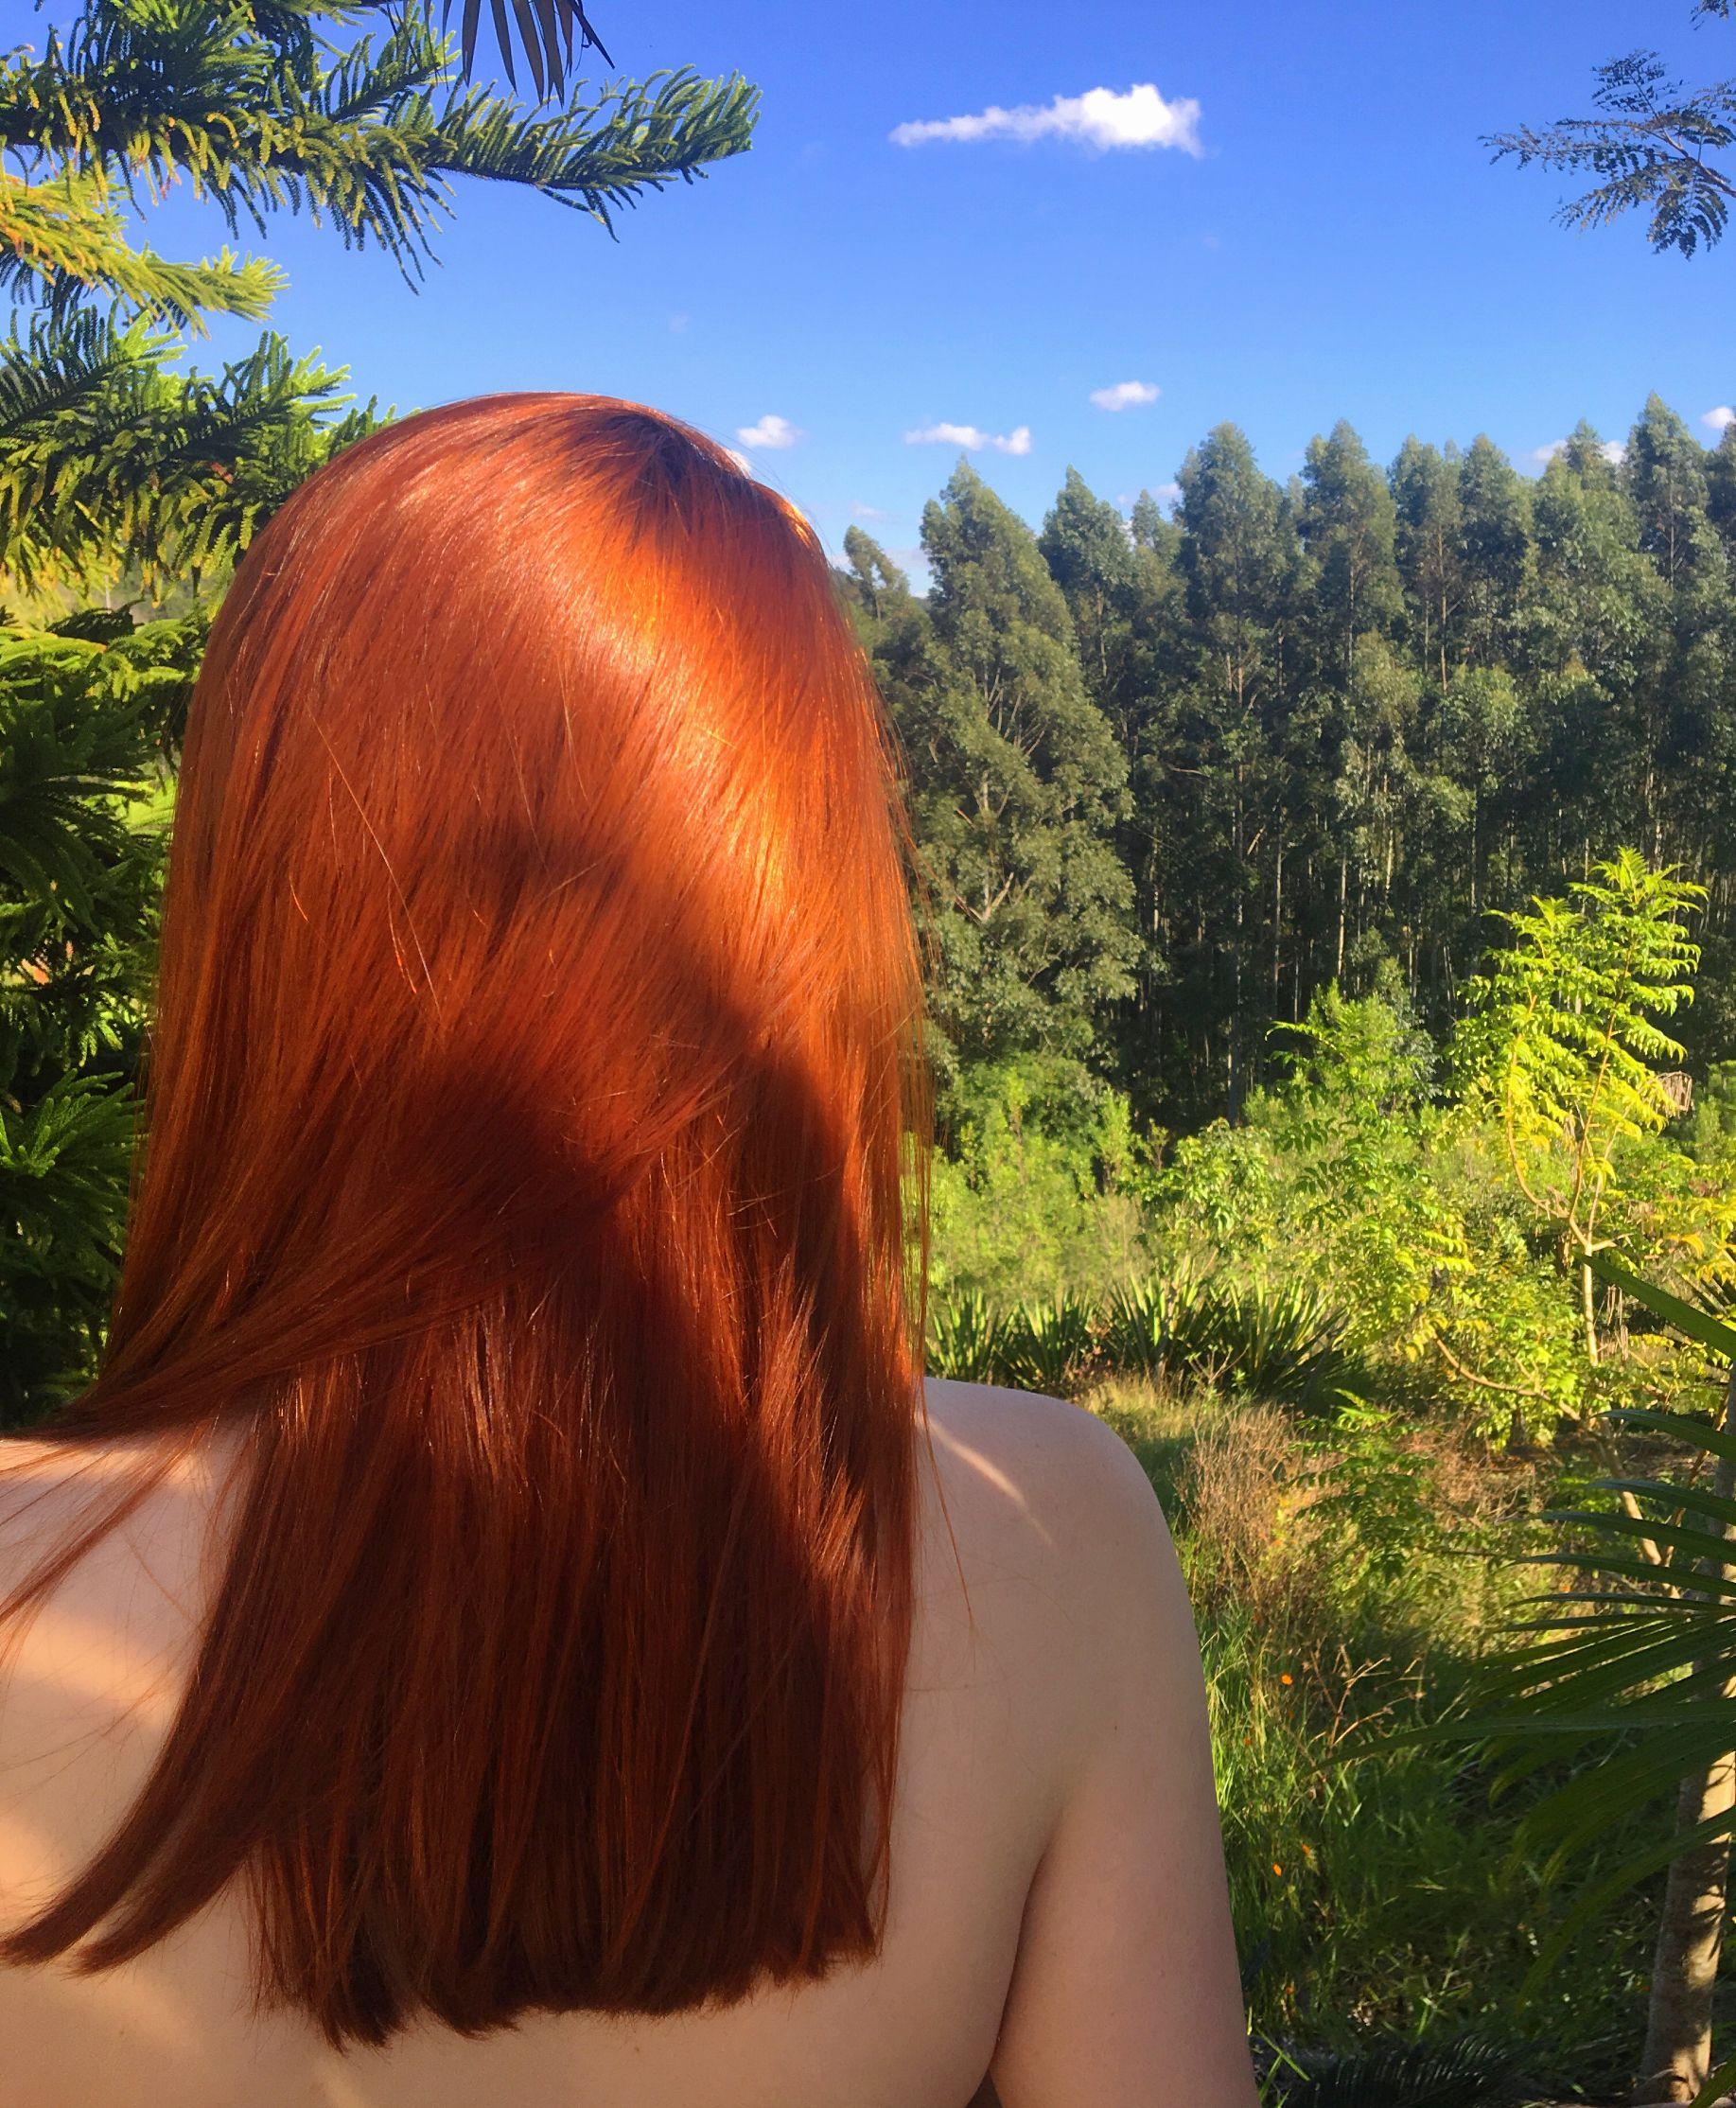 Igora 877 97 Ox 30 Pretty Healthy Hair Cabelo